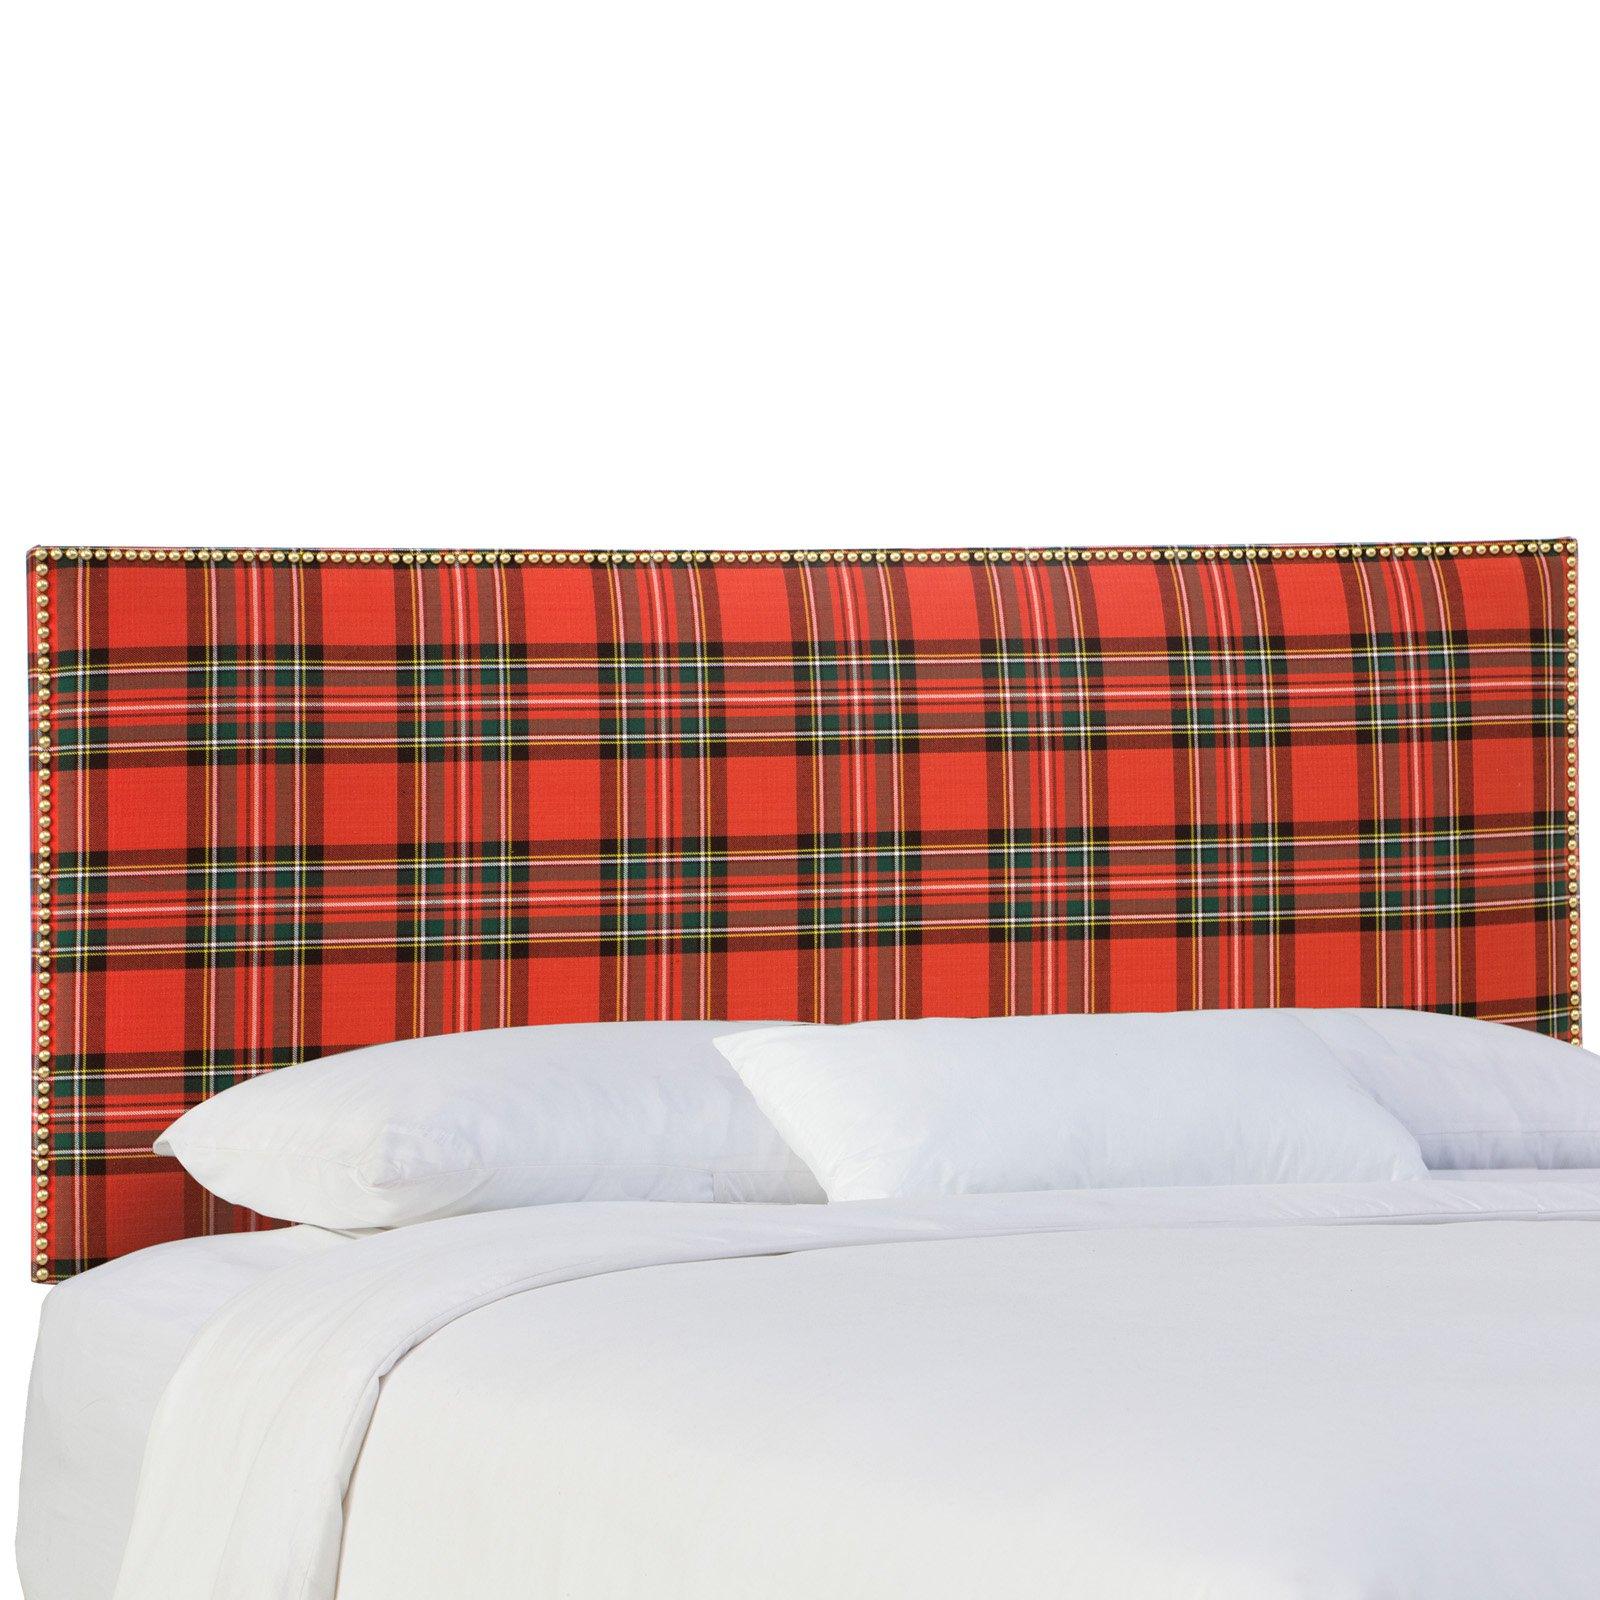 Skyline Furniture Nail Button Border Headboard - Ancient Stewart Red